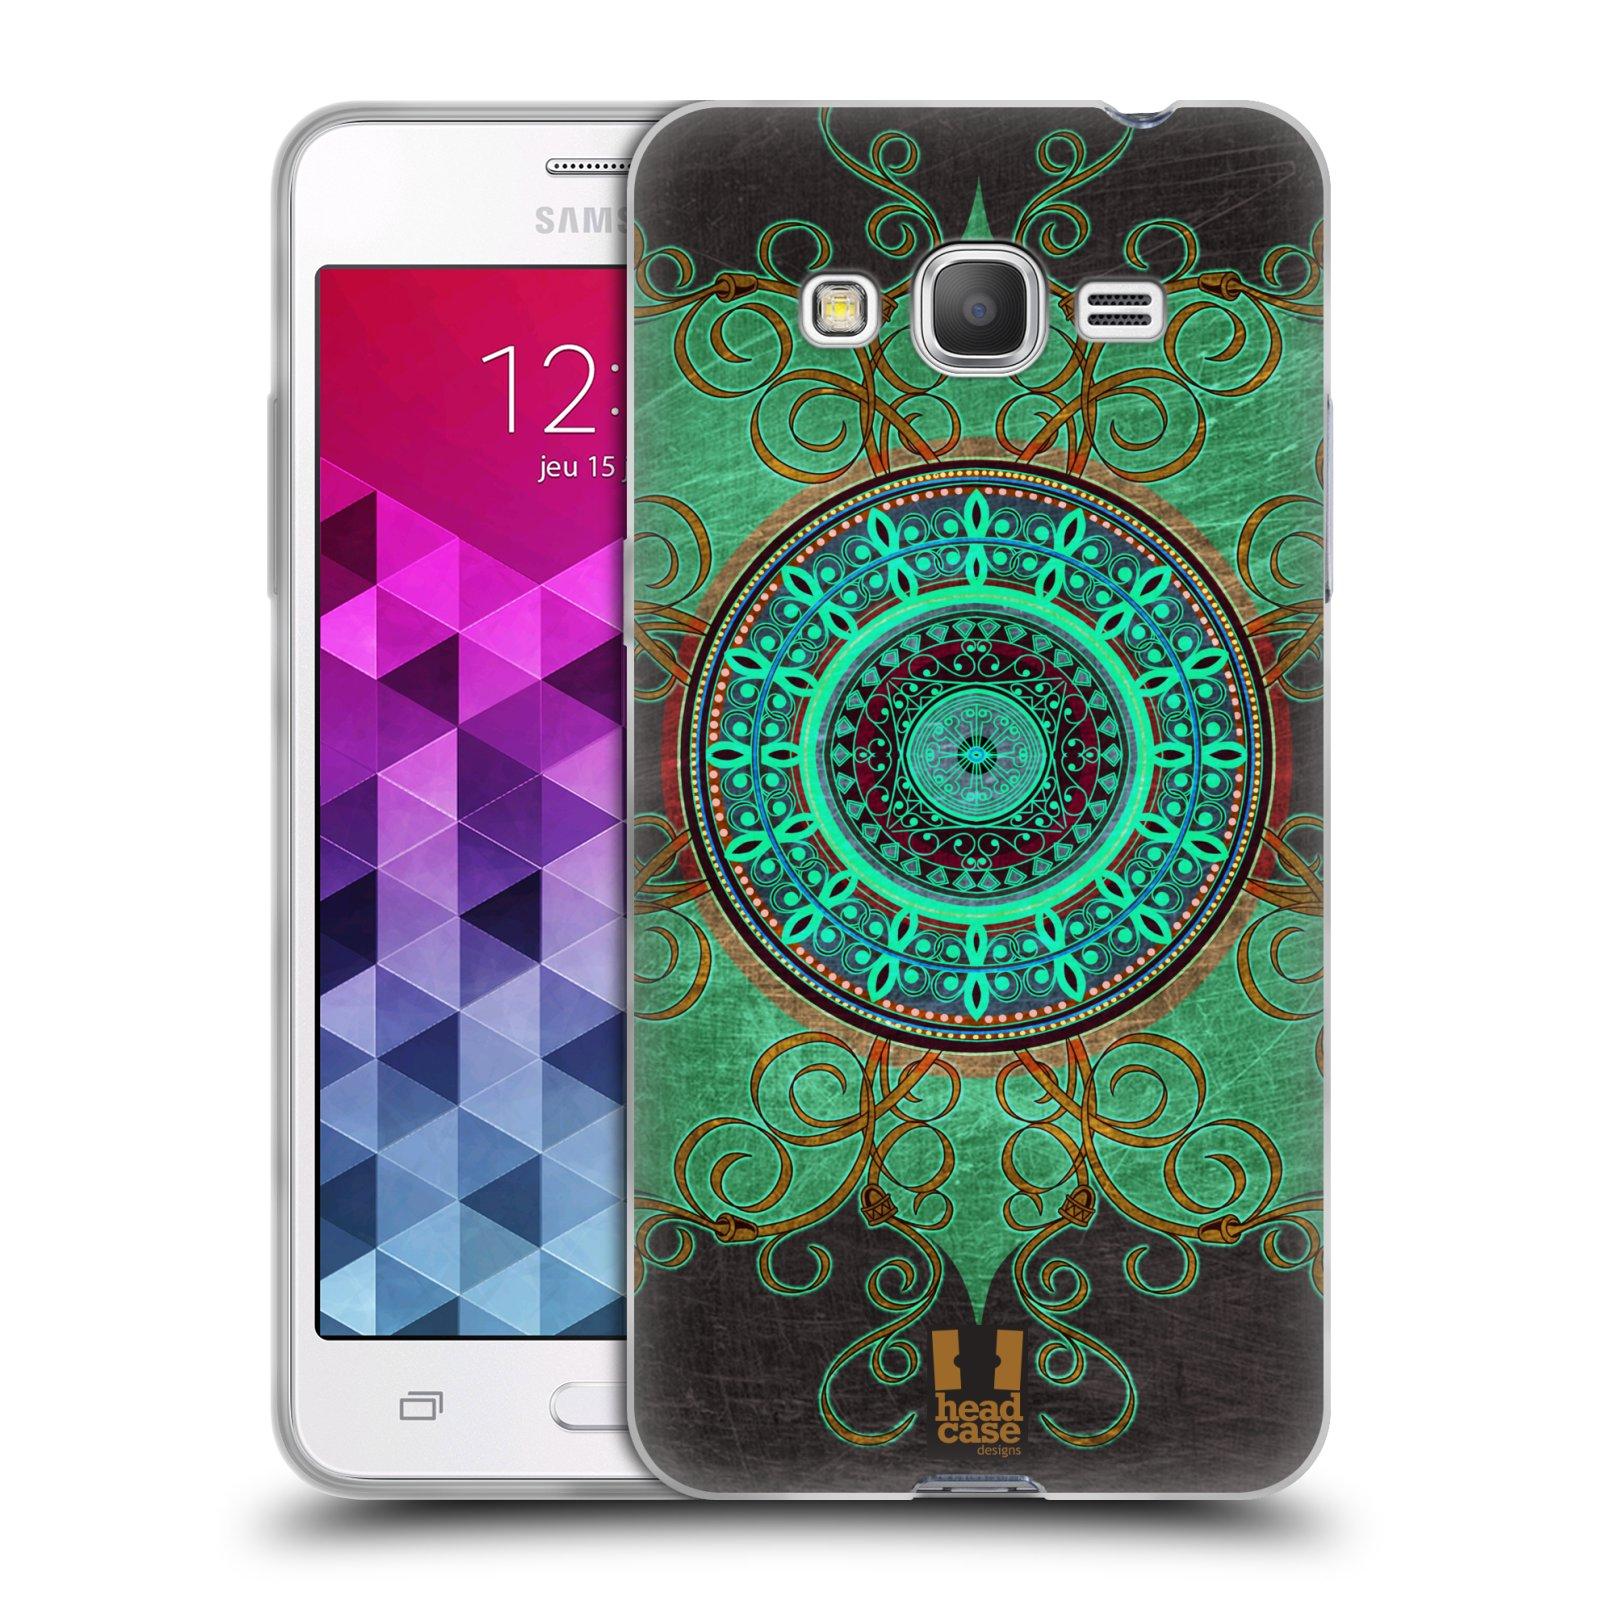 Silikonové pouzdro na mobil Samsung Galaxy Grand Prime HEAD CASE ARAB MANDALA